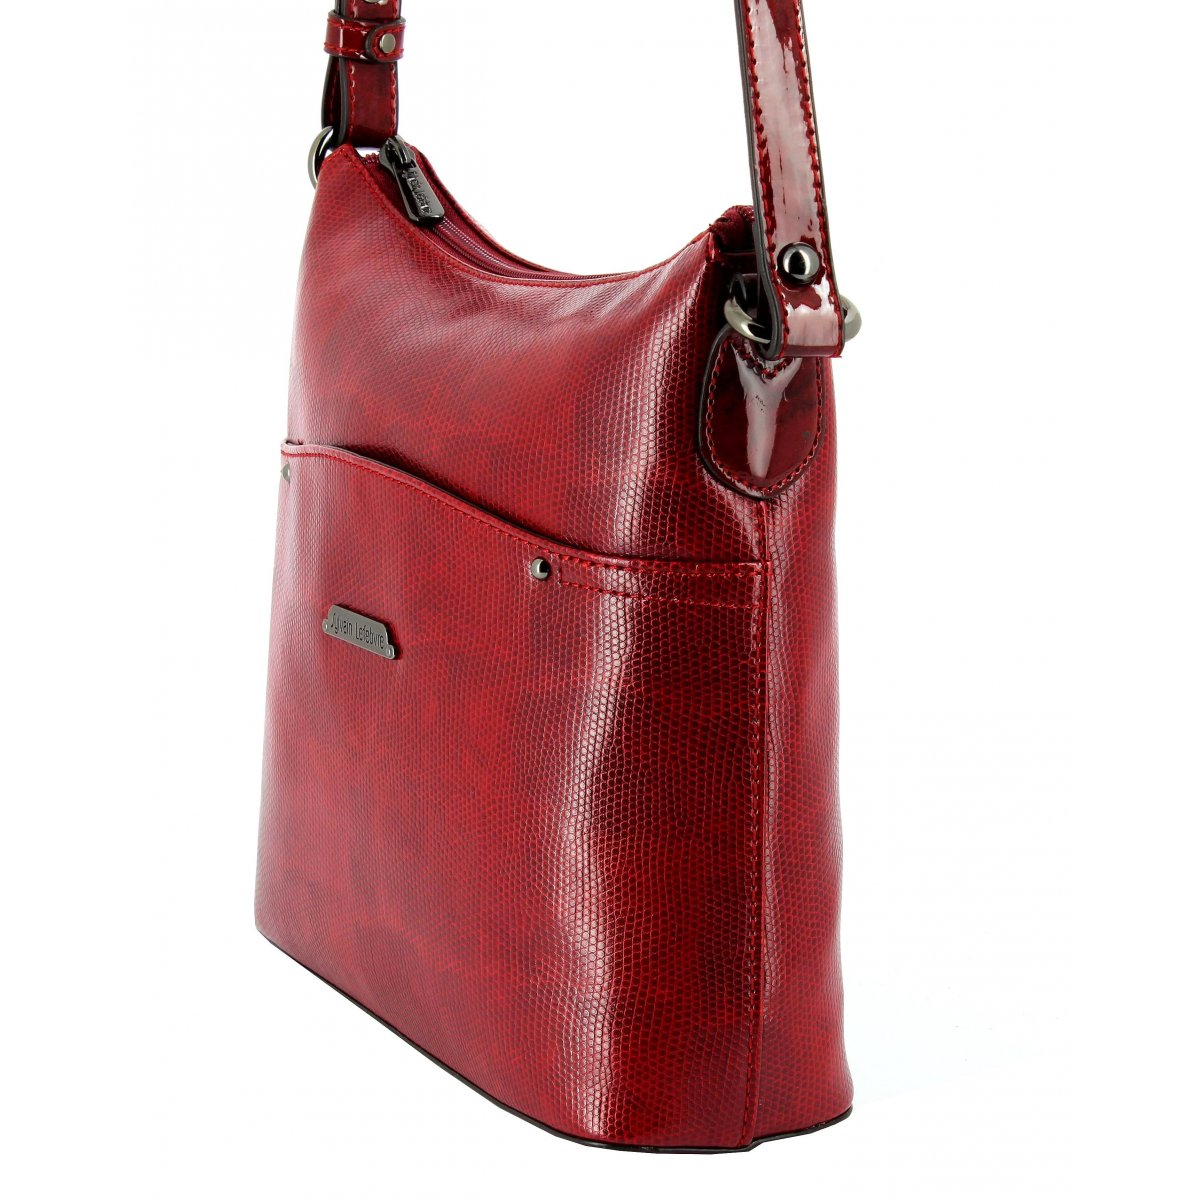 sac main bandouli re sylvain lefebvre sl894653 couleur rouge. Black Bedroom Furniture Sets. Home Design Ideas